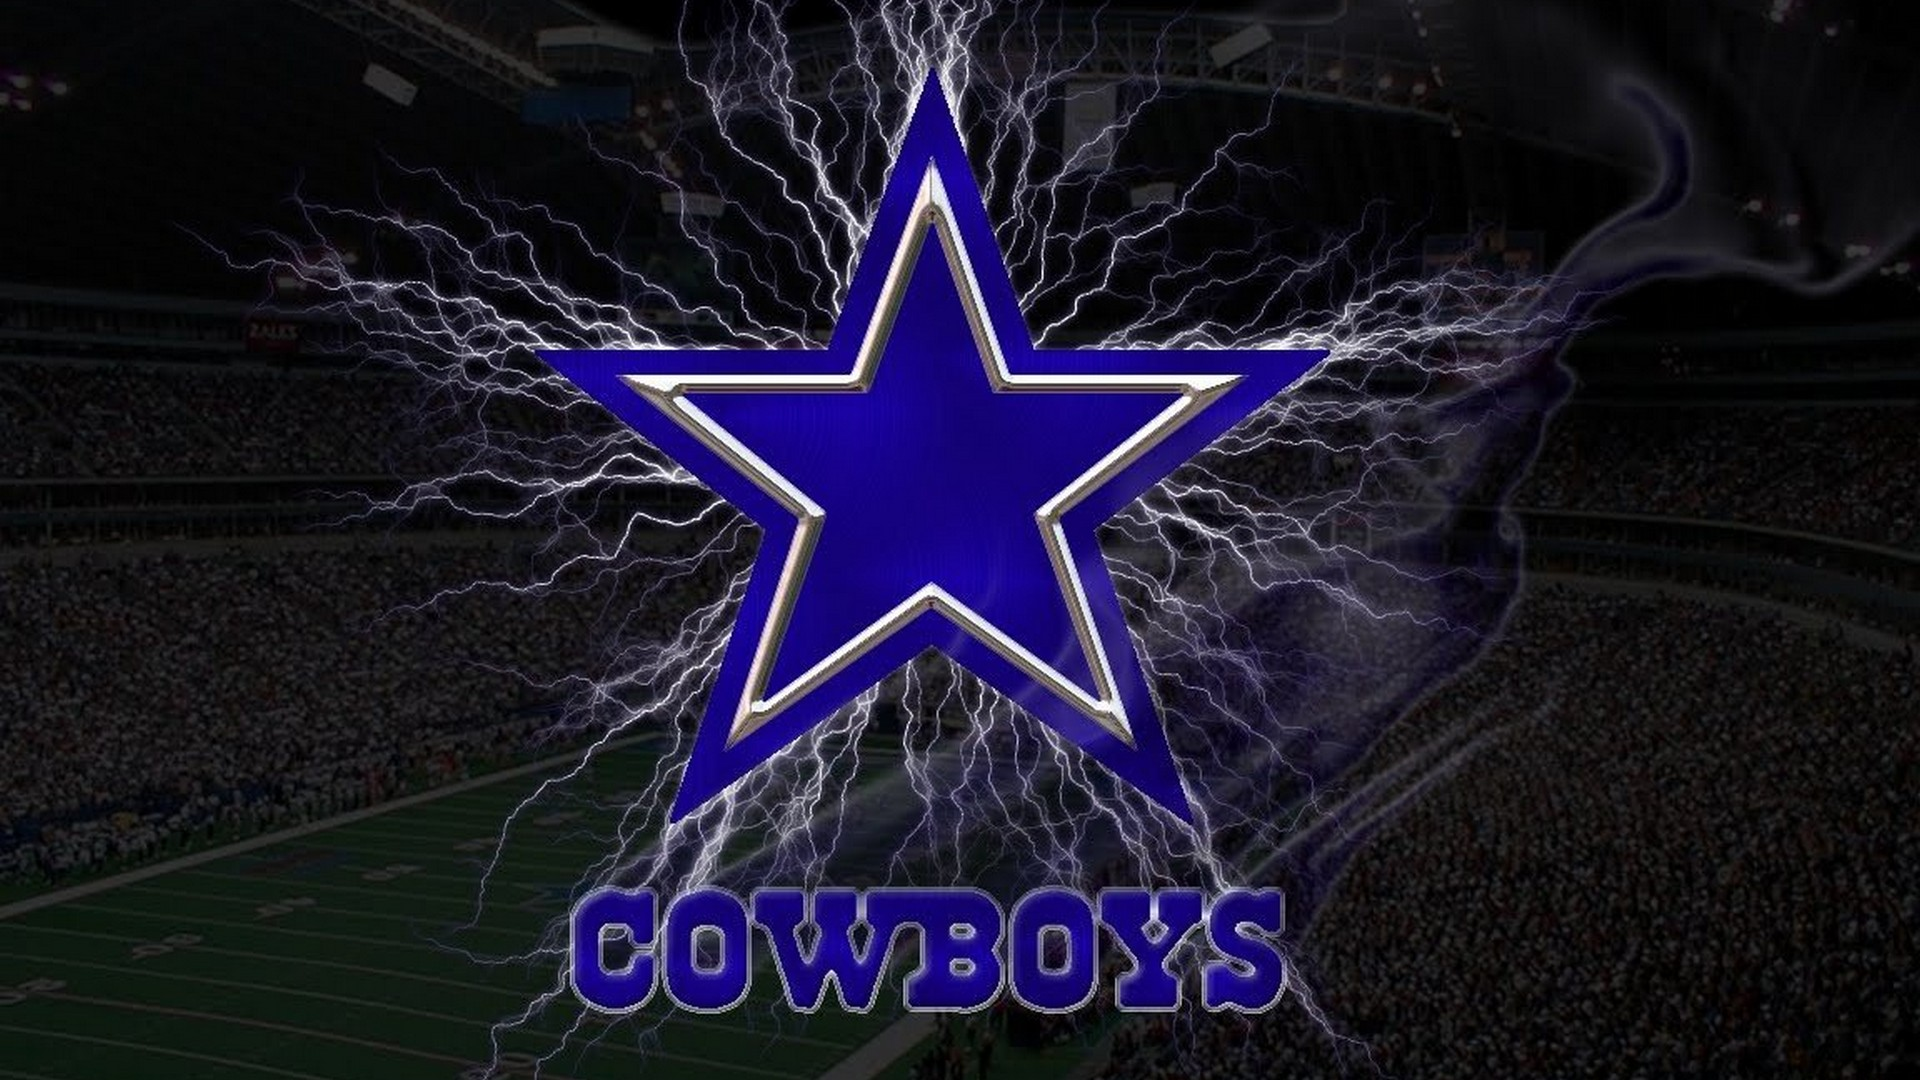 HD Dallas Cowboys Wallpapers 2020 NFL Football Wallpapers 1920x1080